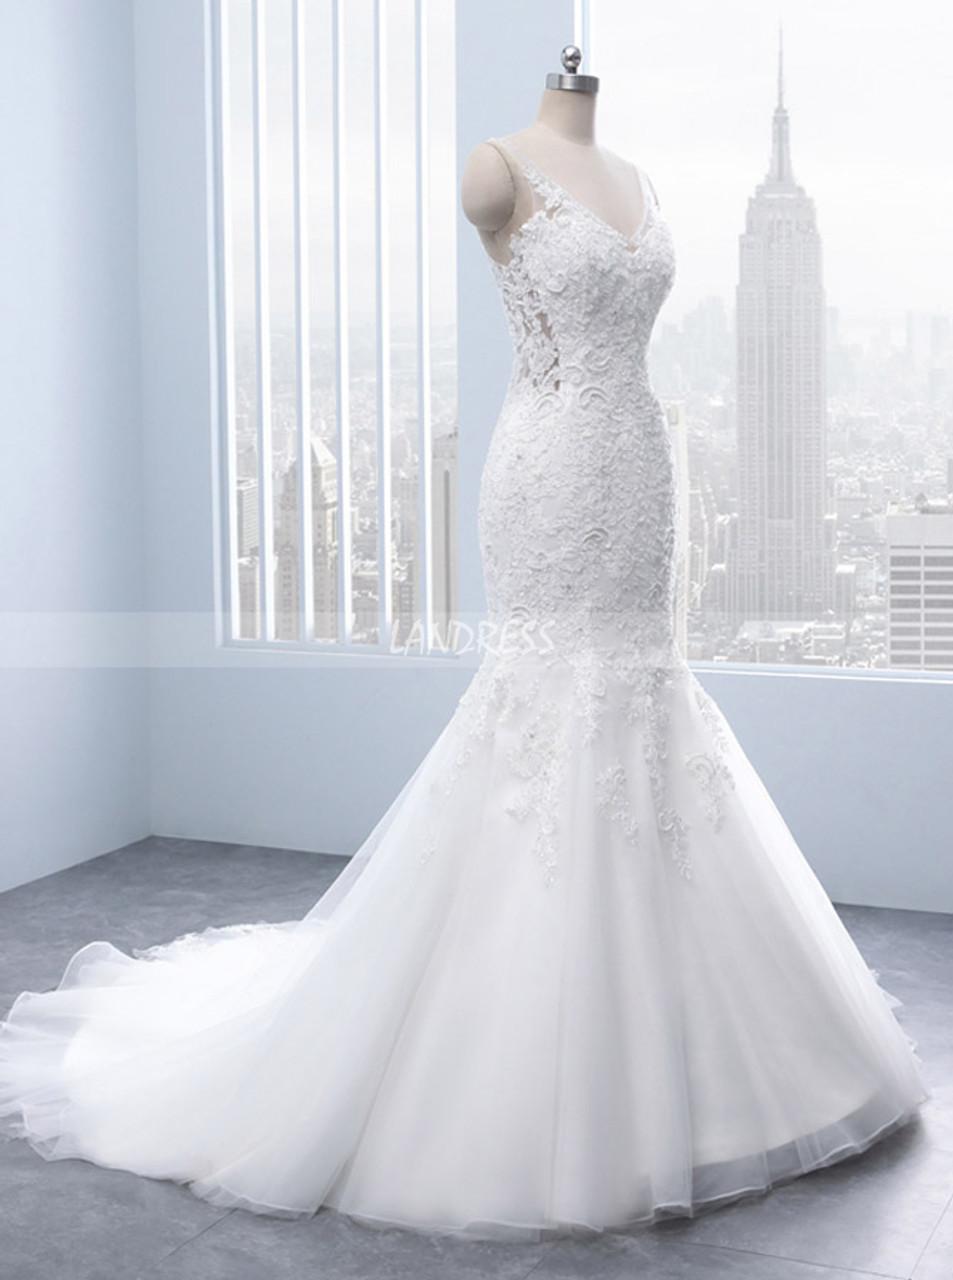 1e247722881f ... Mermaid Wedding Dress,Modest Wedding Dress with Open Back,11686.  Previous Next